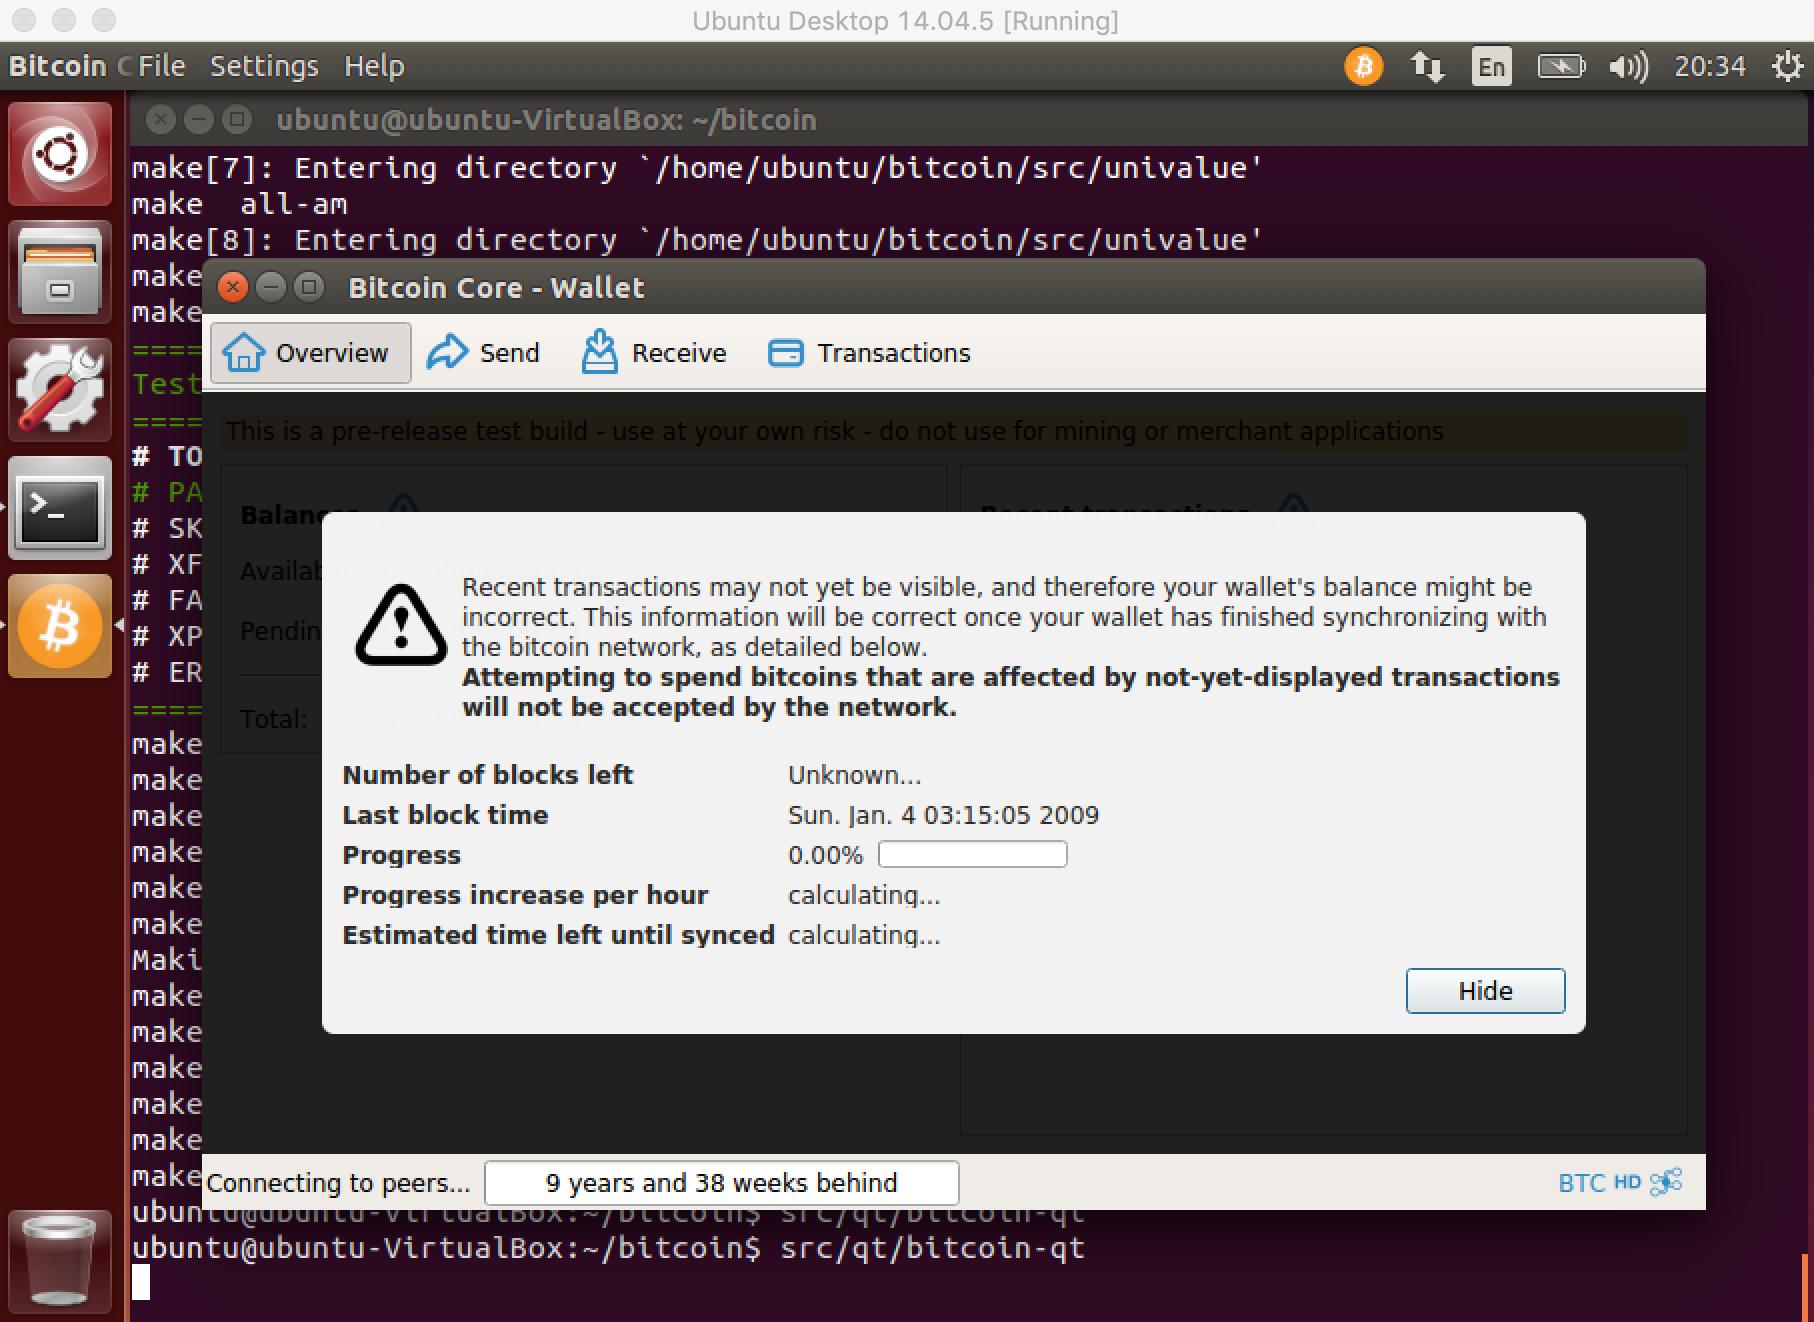 patch ubuntu 14